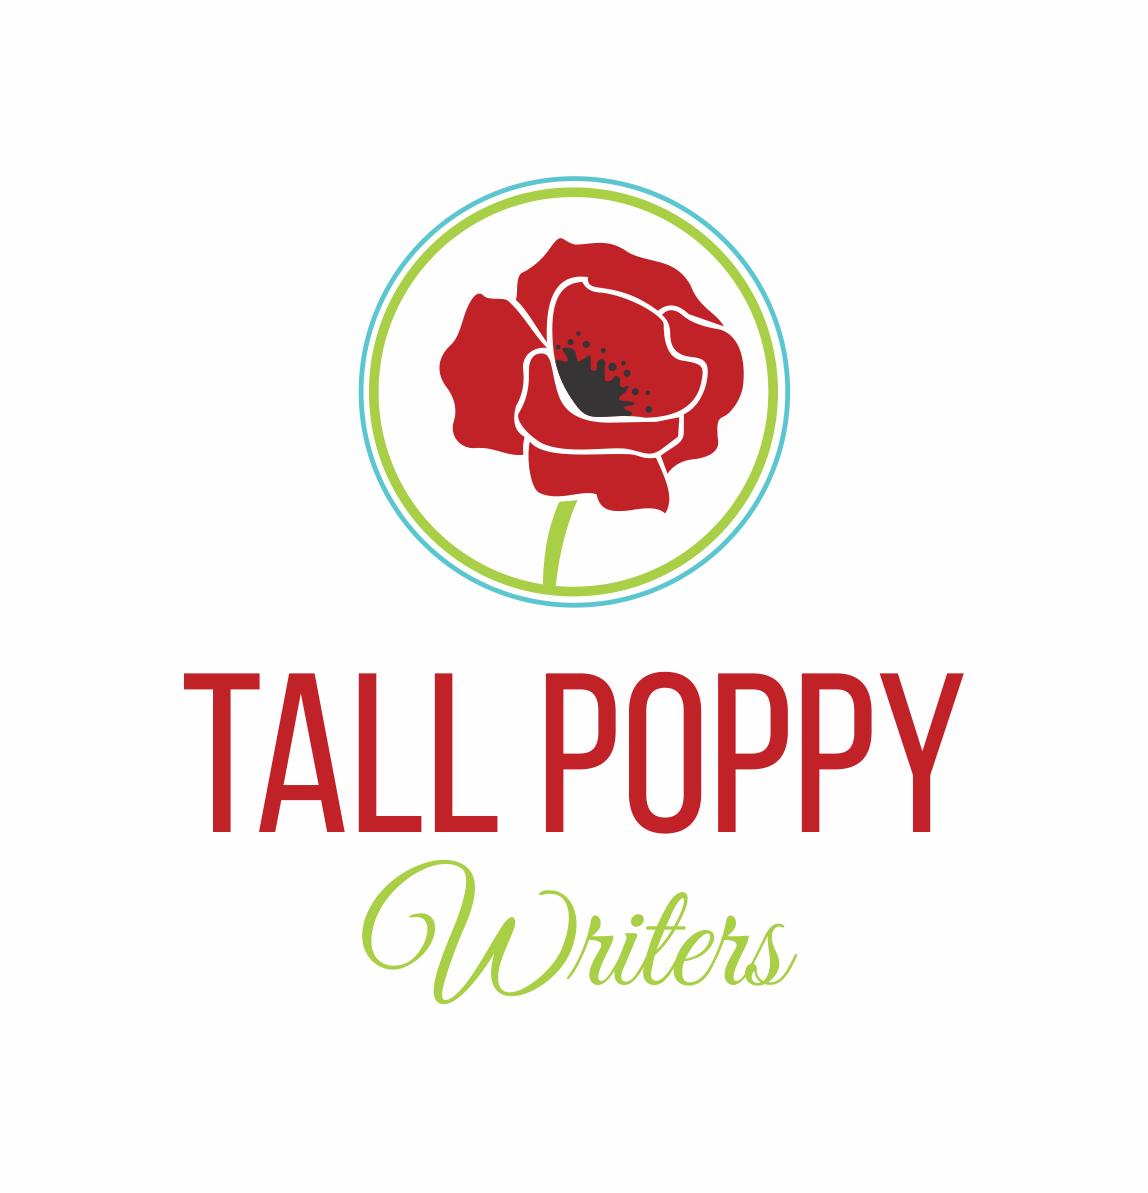 tallpoppywriters